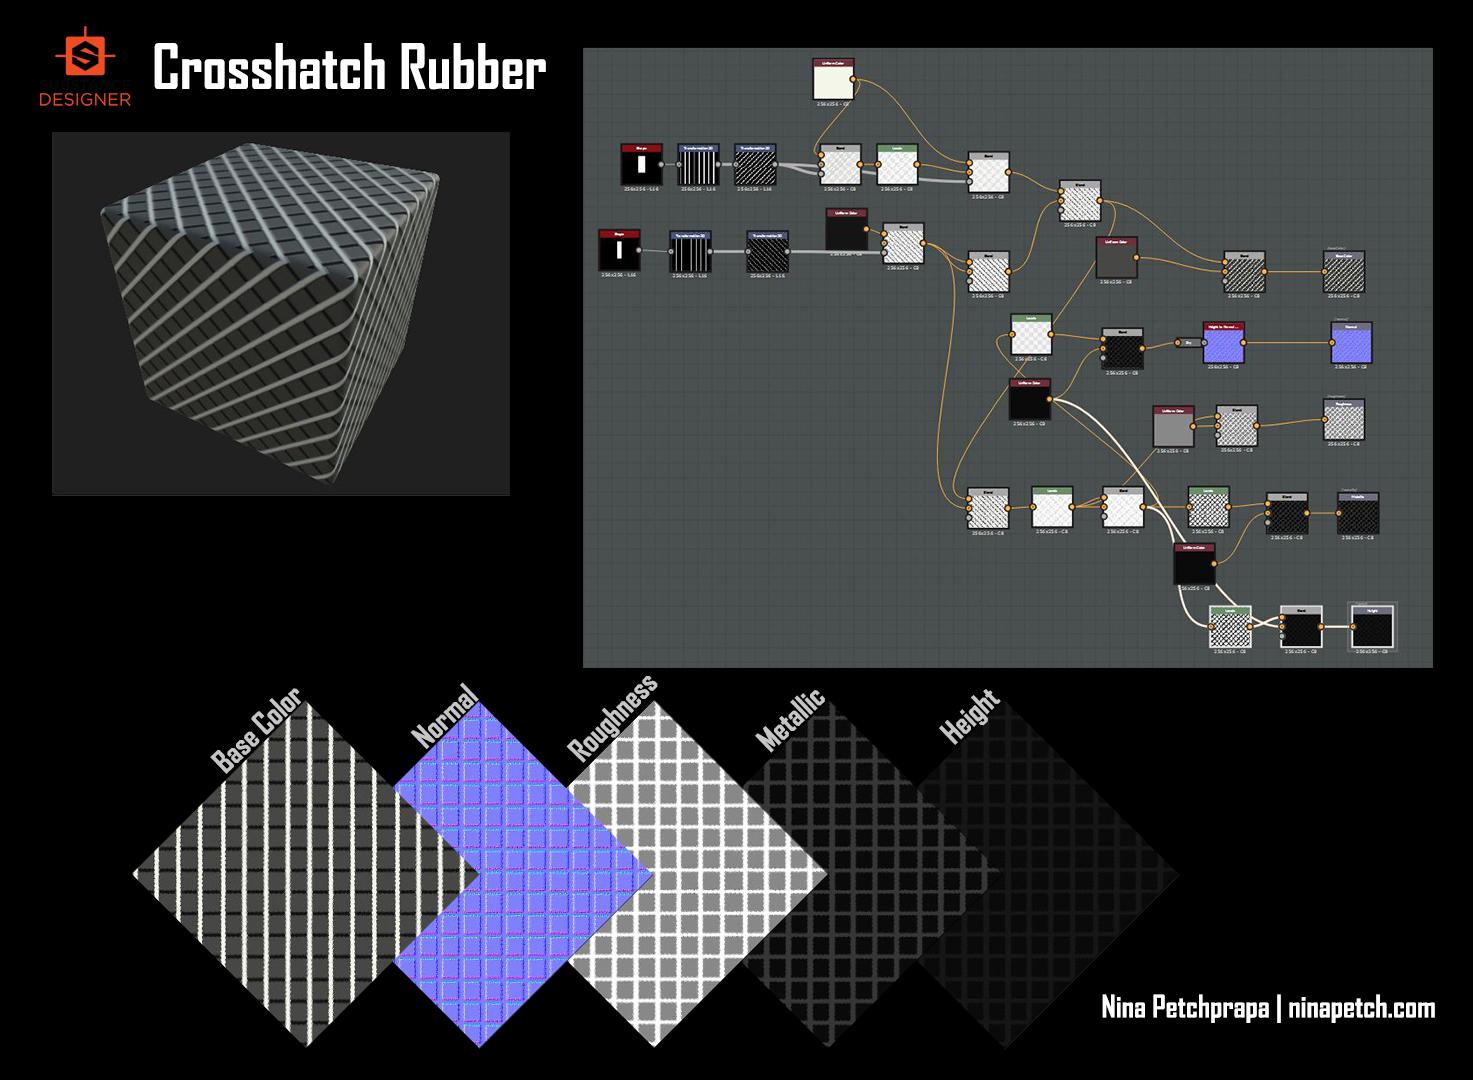 Crosshatch Rubber